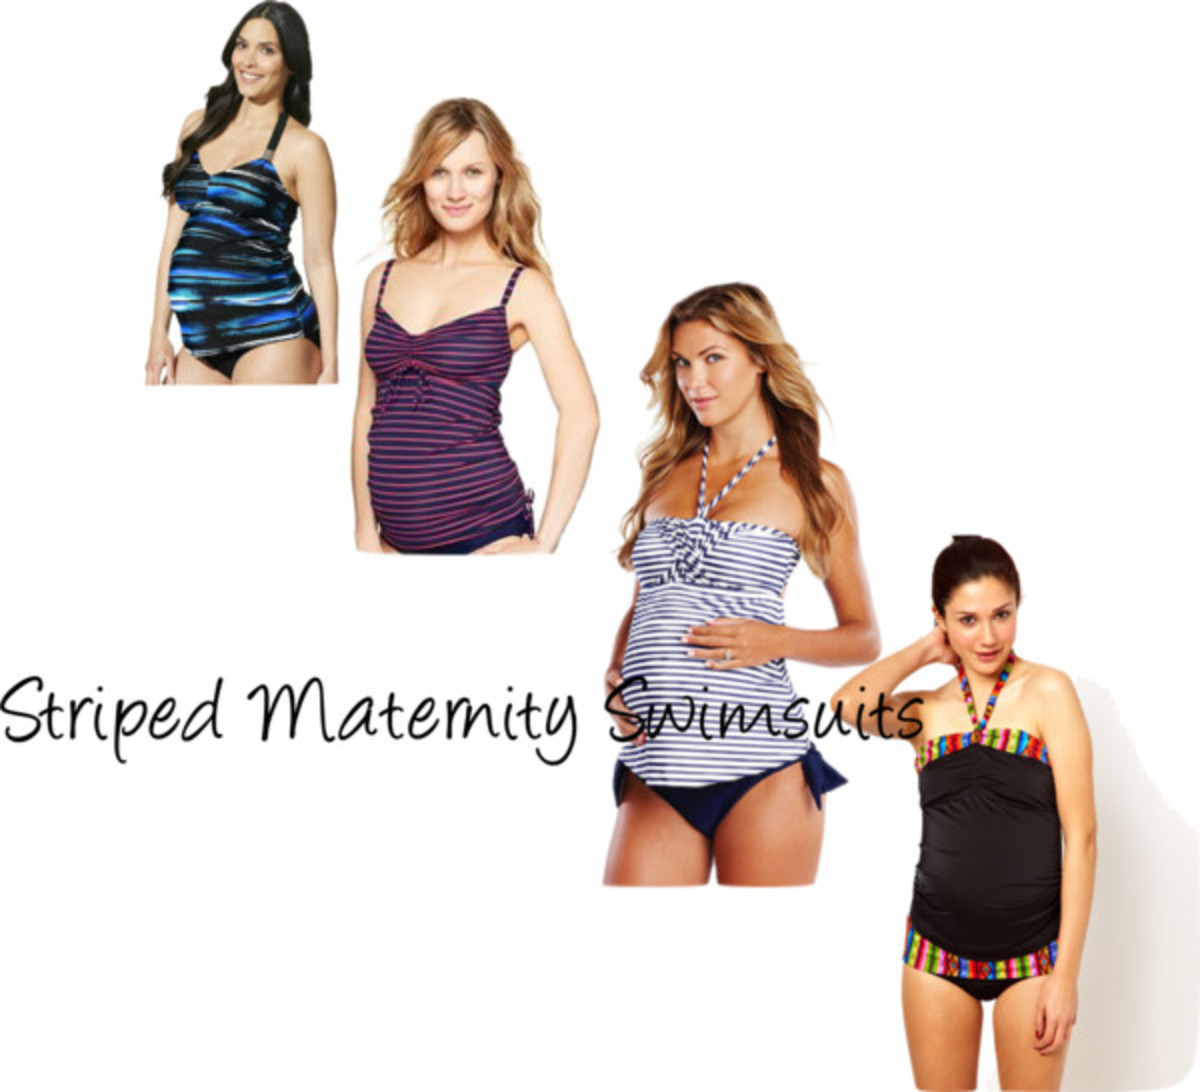 striped maternity swim